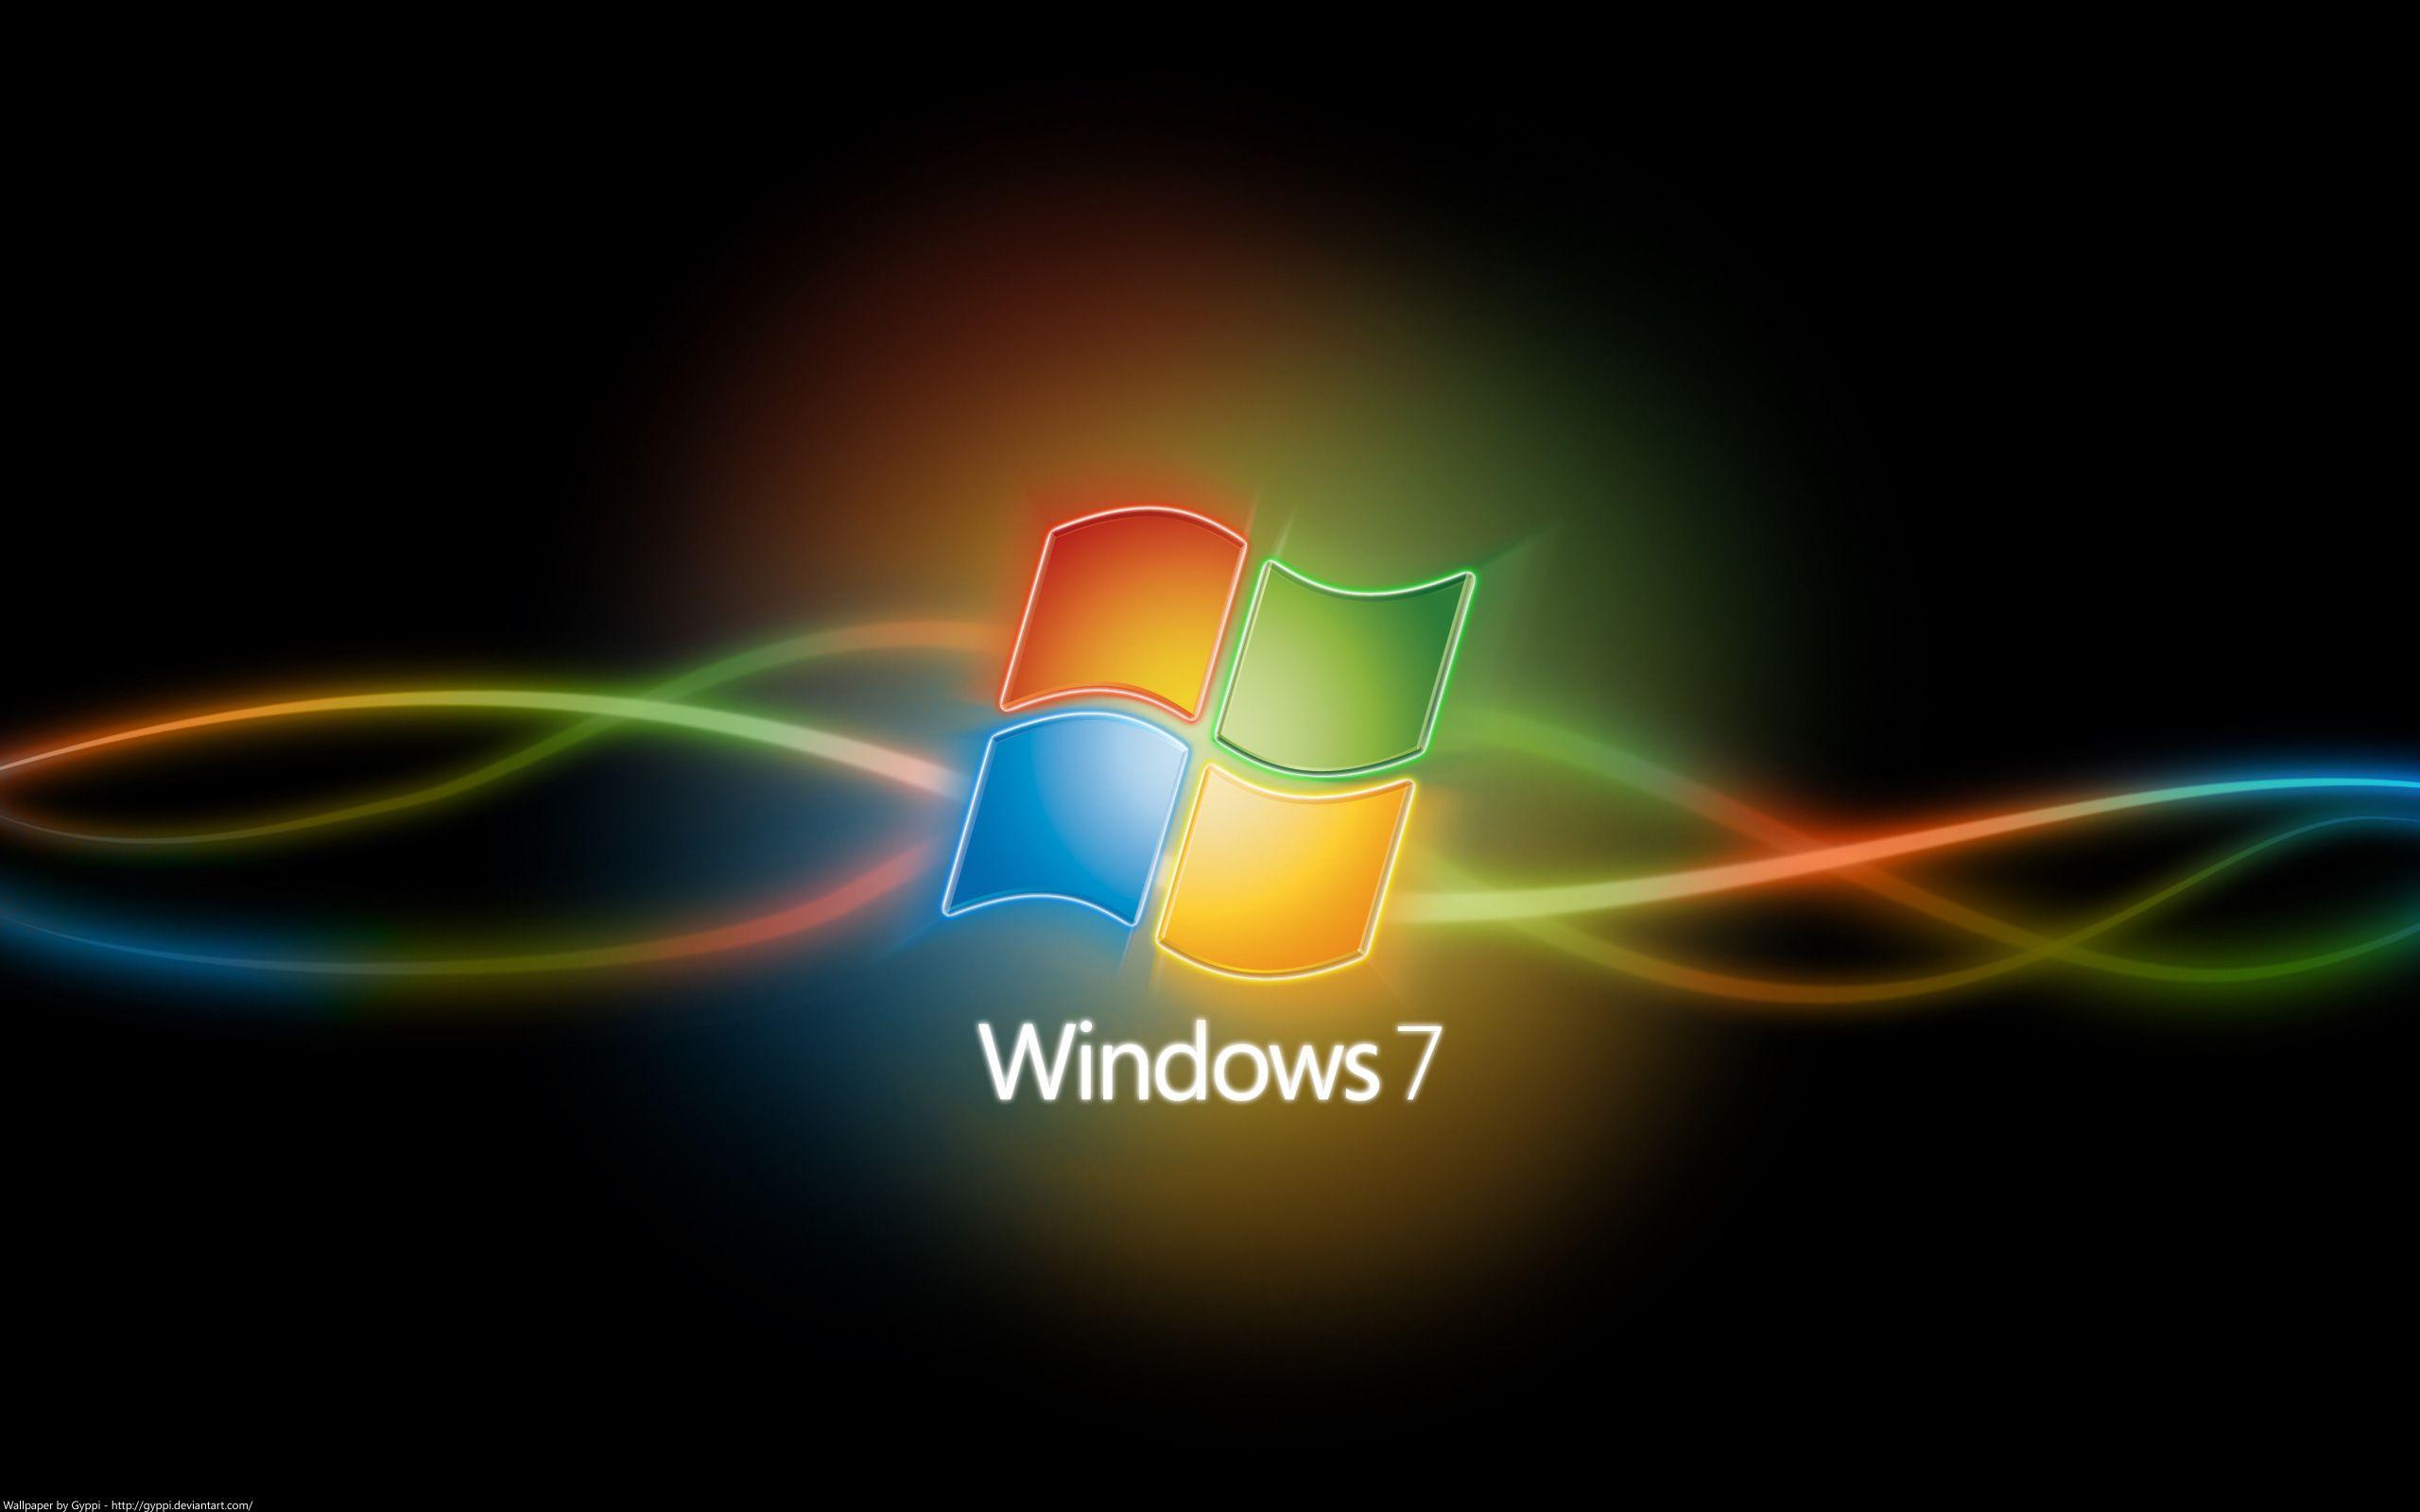 Windows 7 Crystal Black Logo Hd Wallpaper Computer Wallpaper Hd Dual Screen Wallpaper Dark Wallpaper